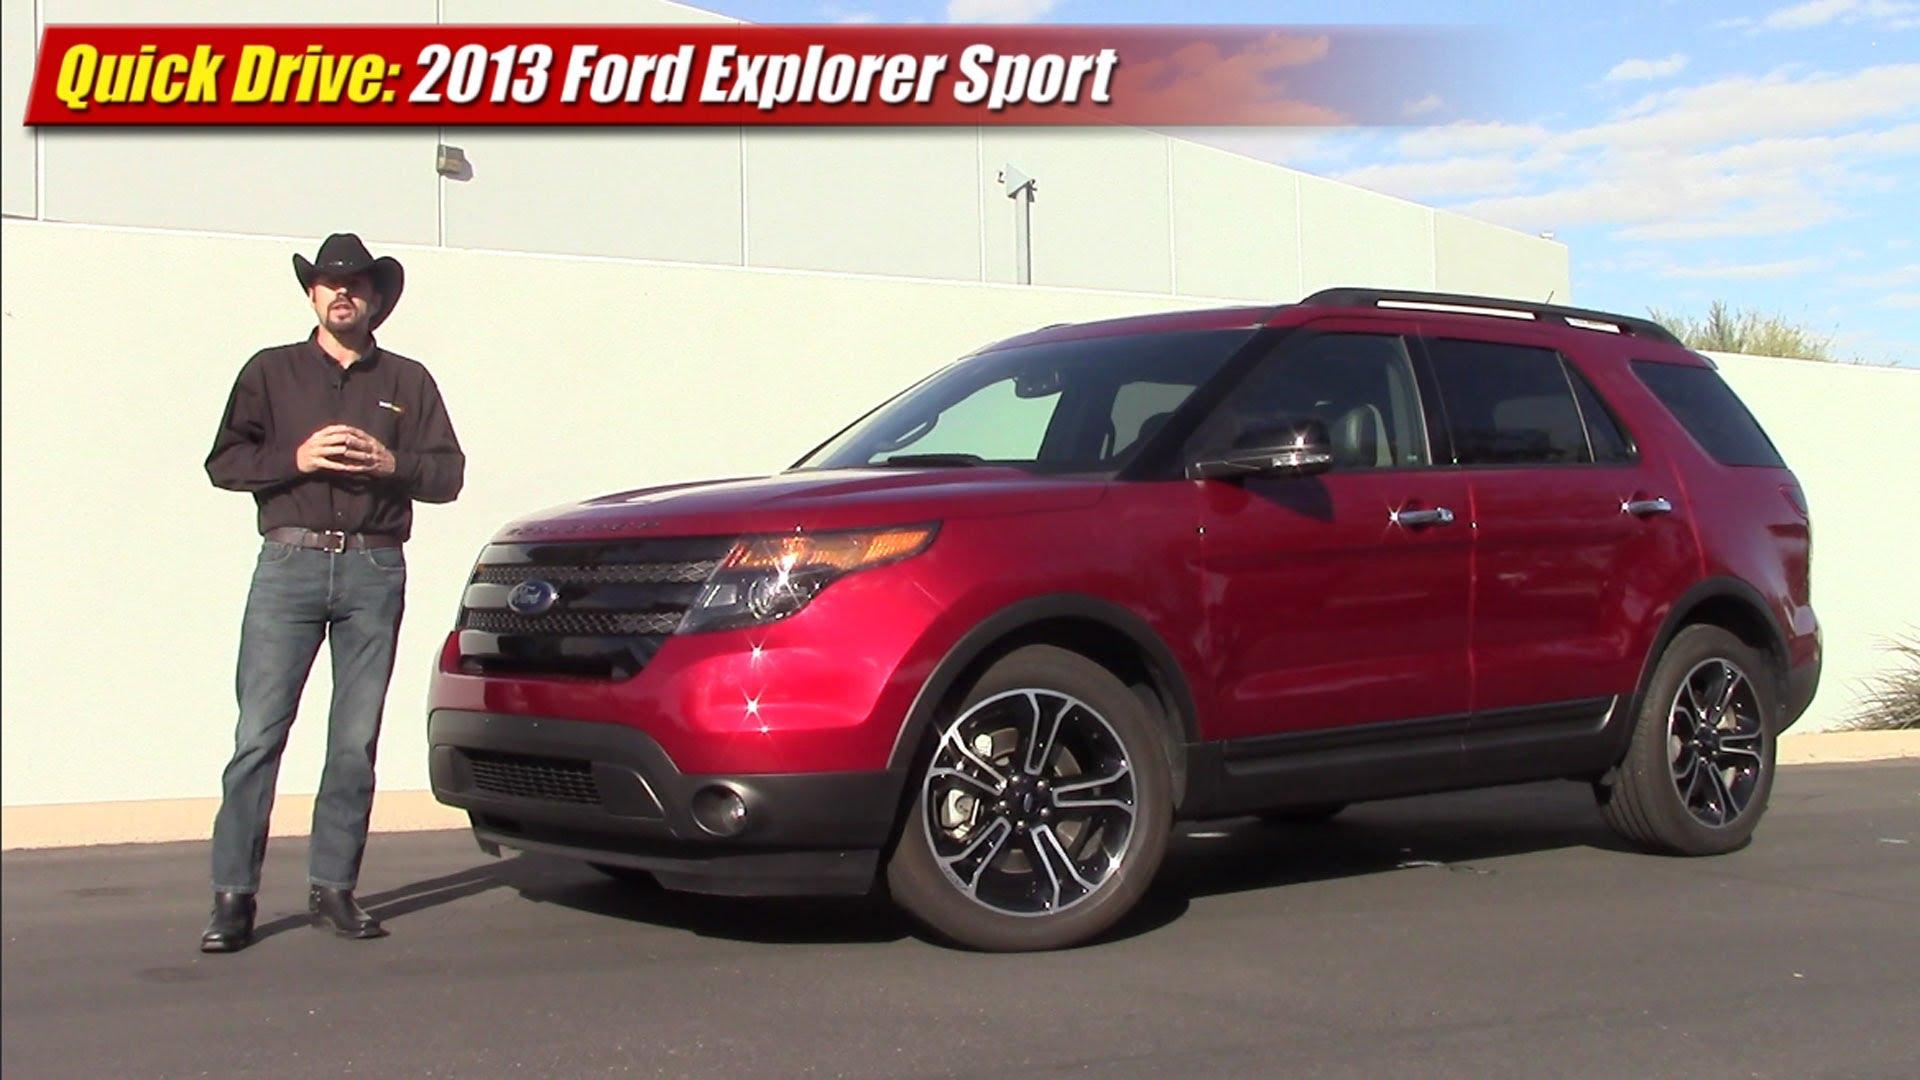 Quick Drive 2013 Ford Explorer Sport Testdriven Tv